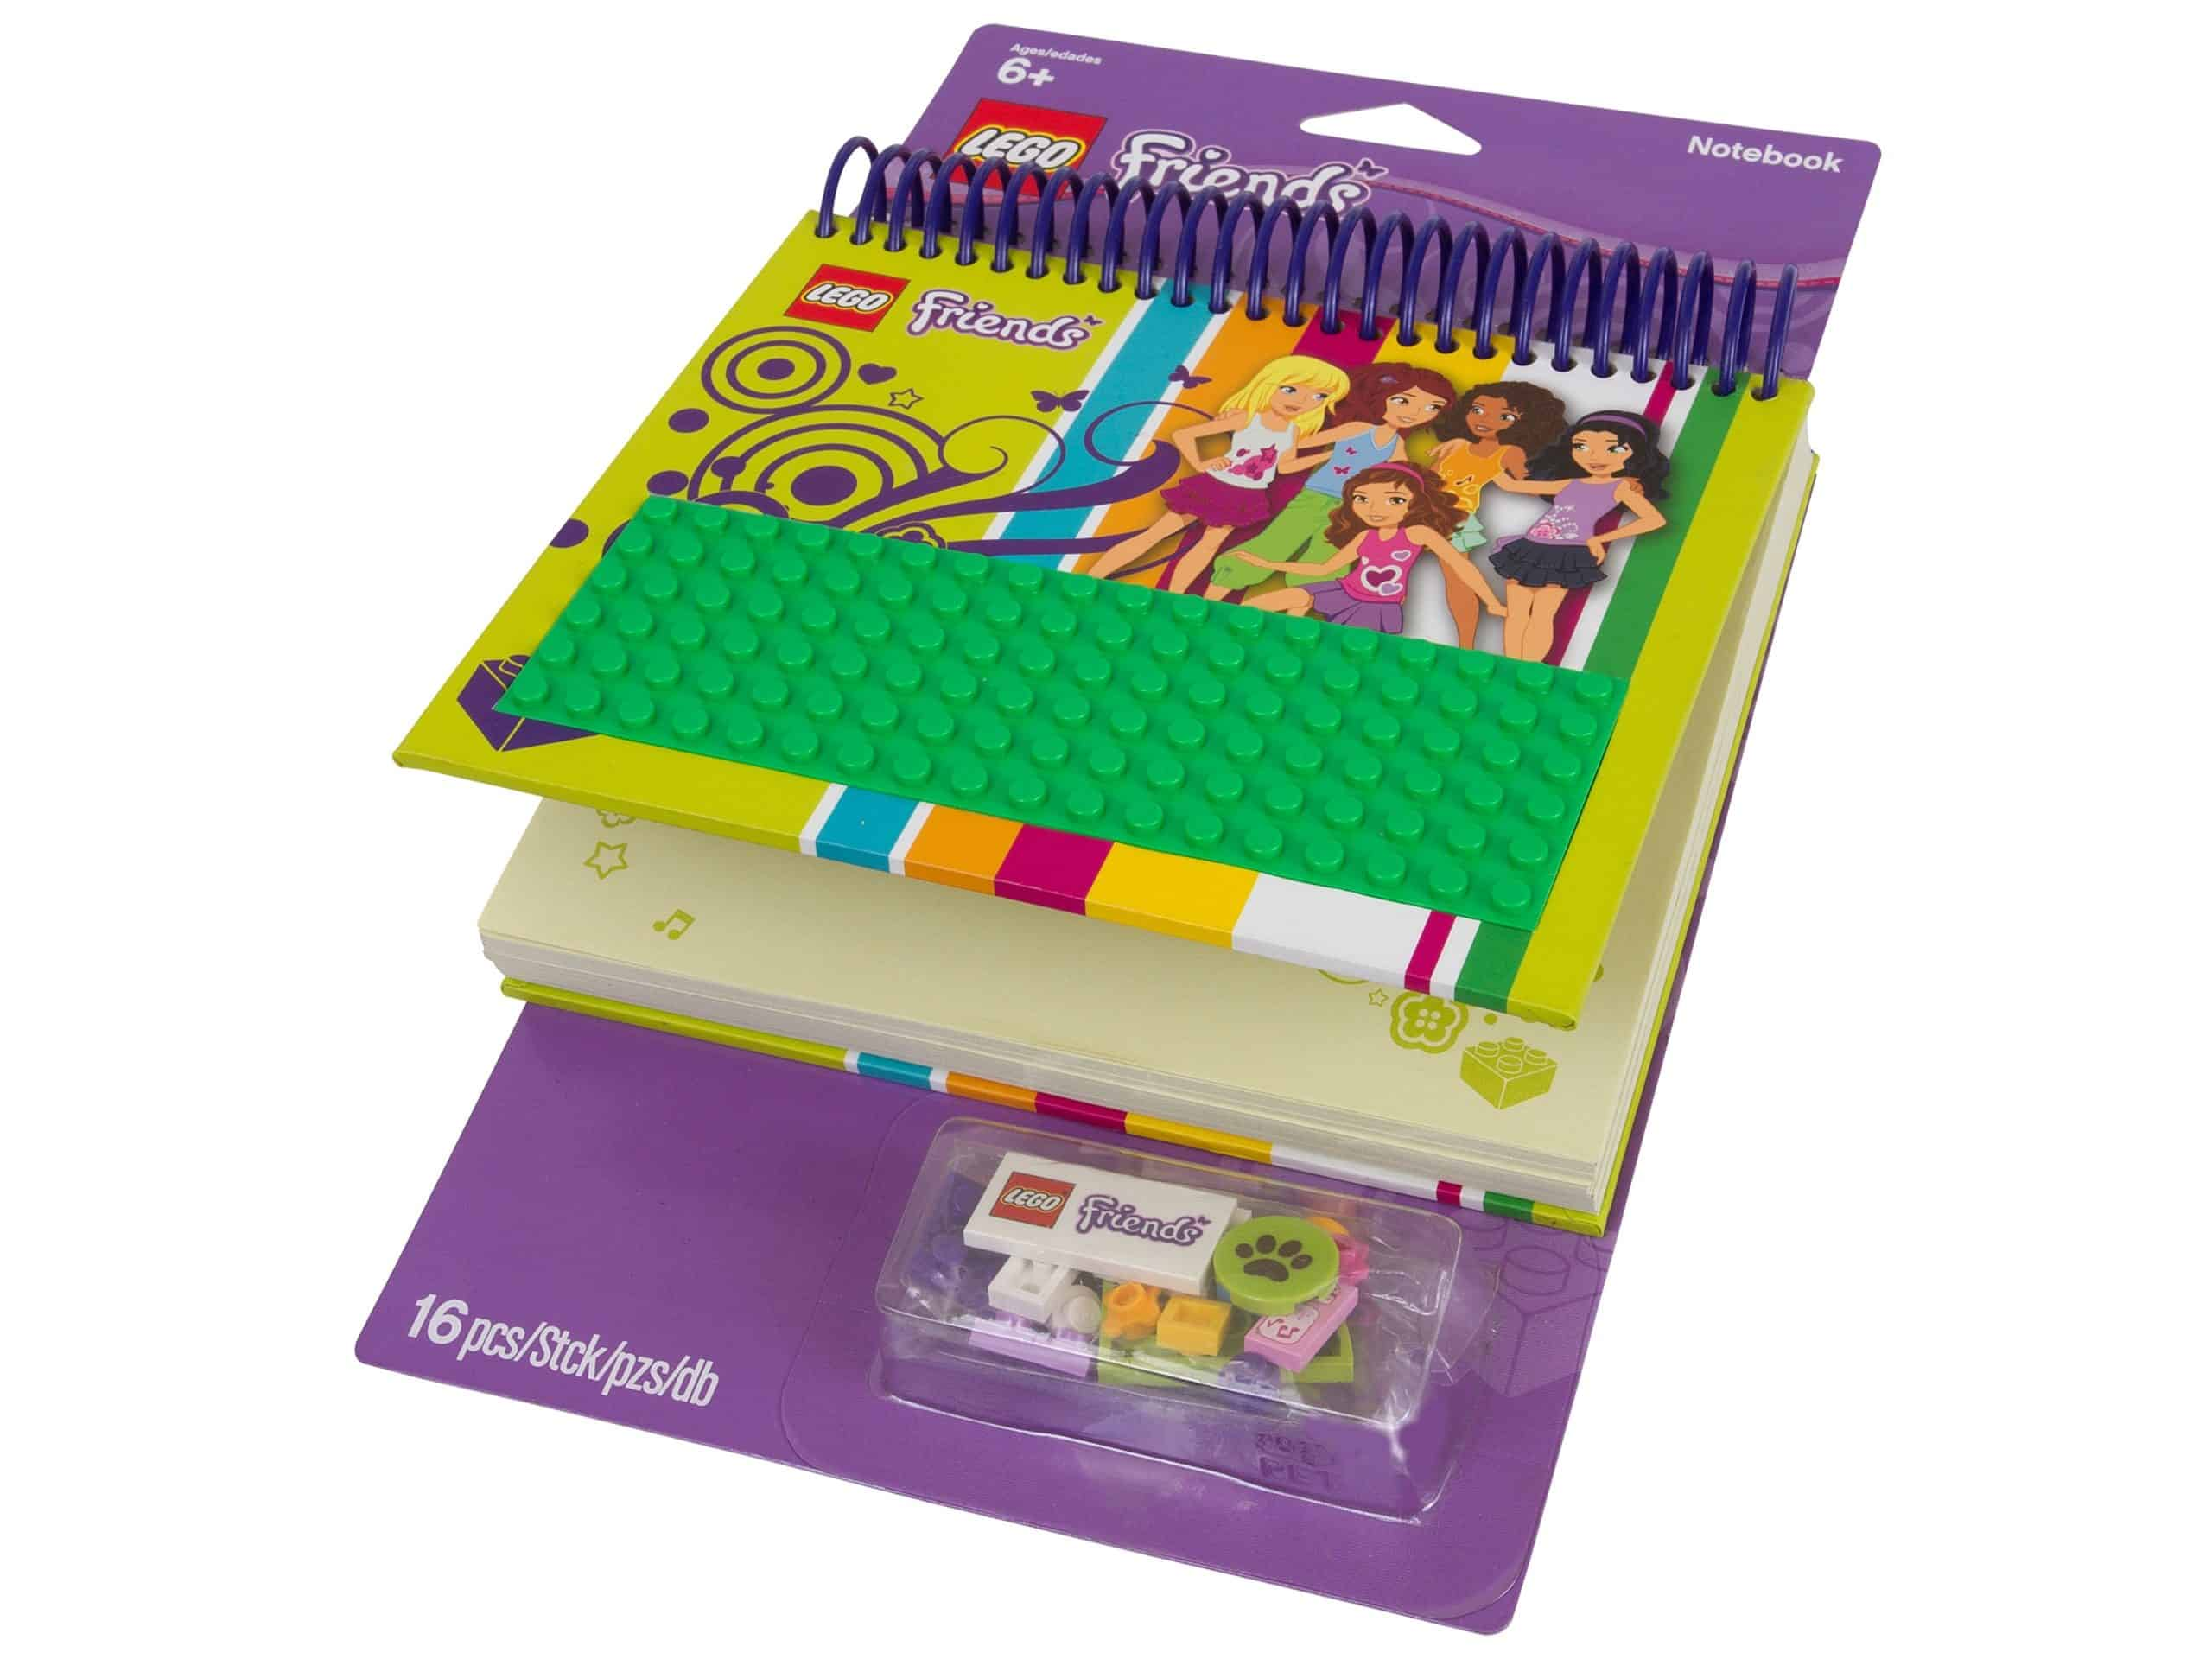 lego 850595 friends notesbog scaled